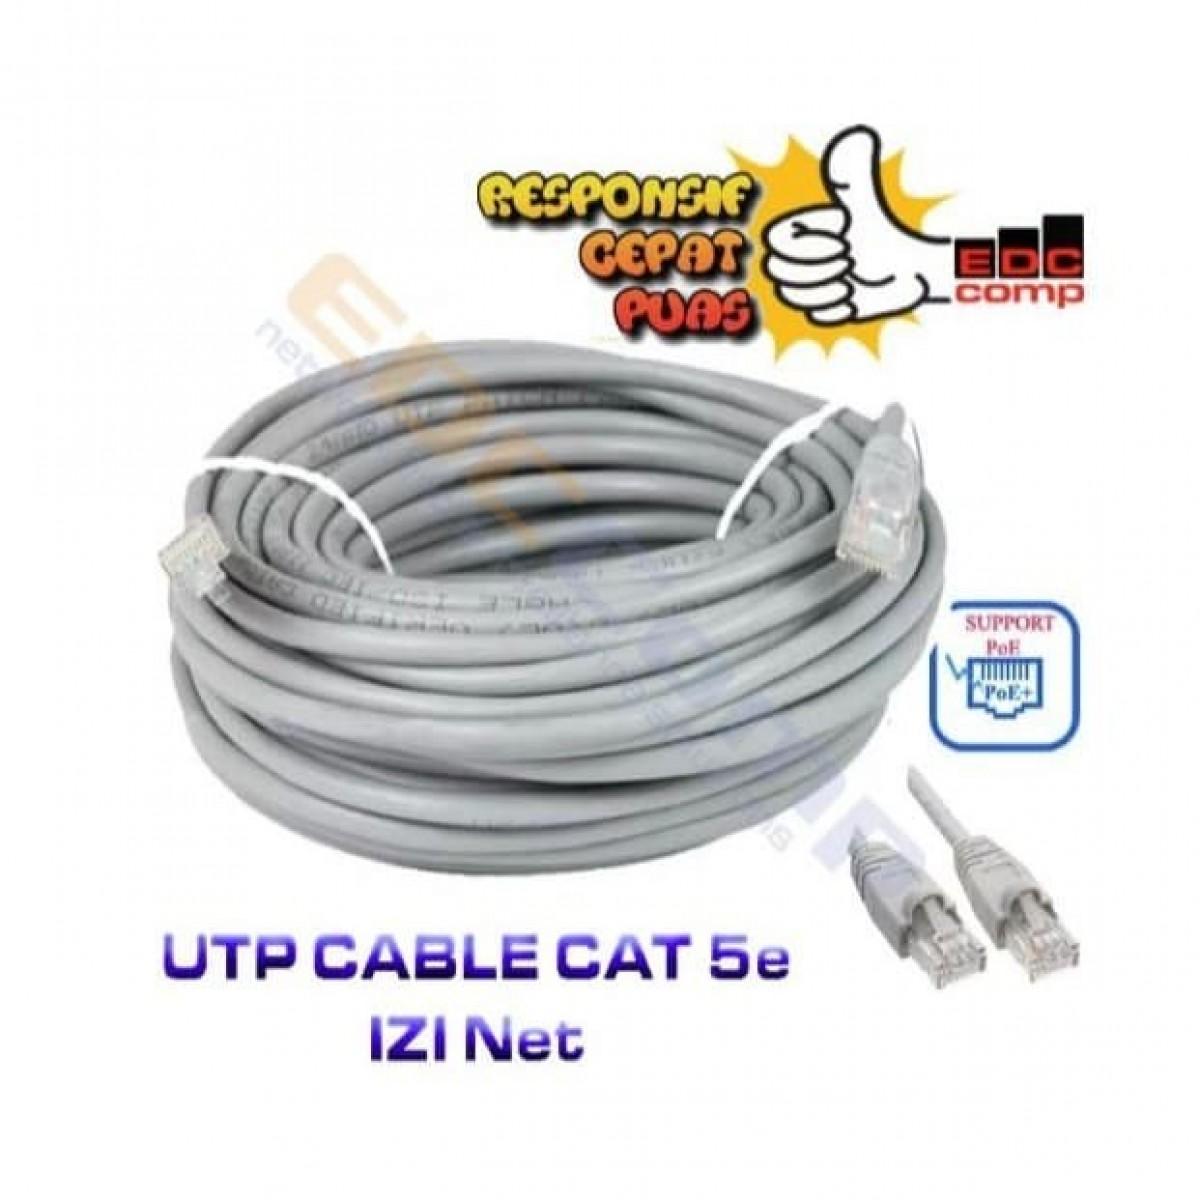 UTP Cable IZINET Cat5E 95 Meter - EdcComp